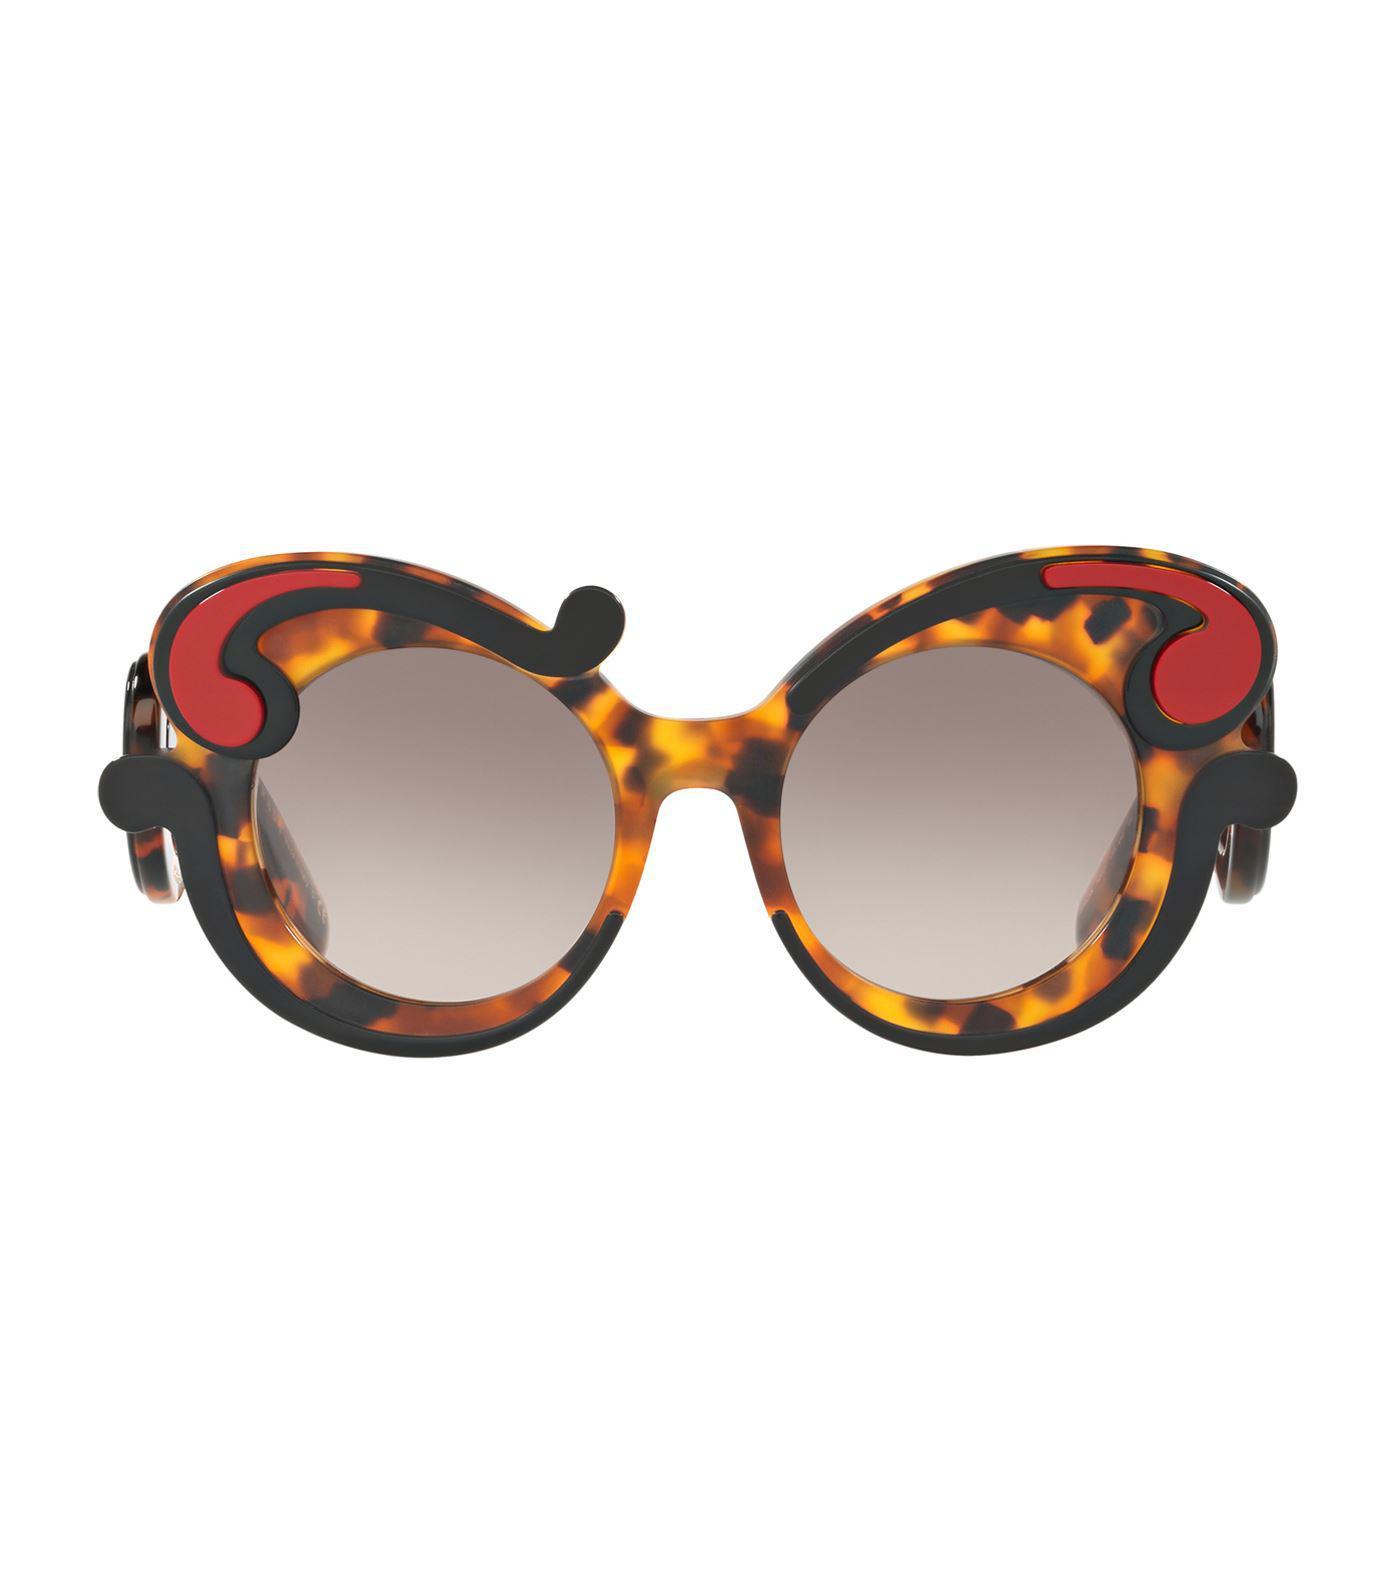 27b3c82861e Lyst - Prada Havana Minimal Baroque Sunglasses in Black